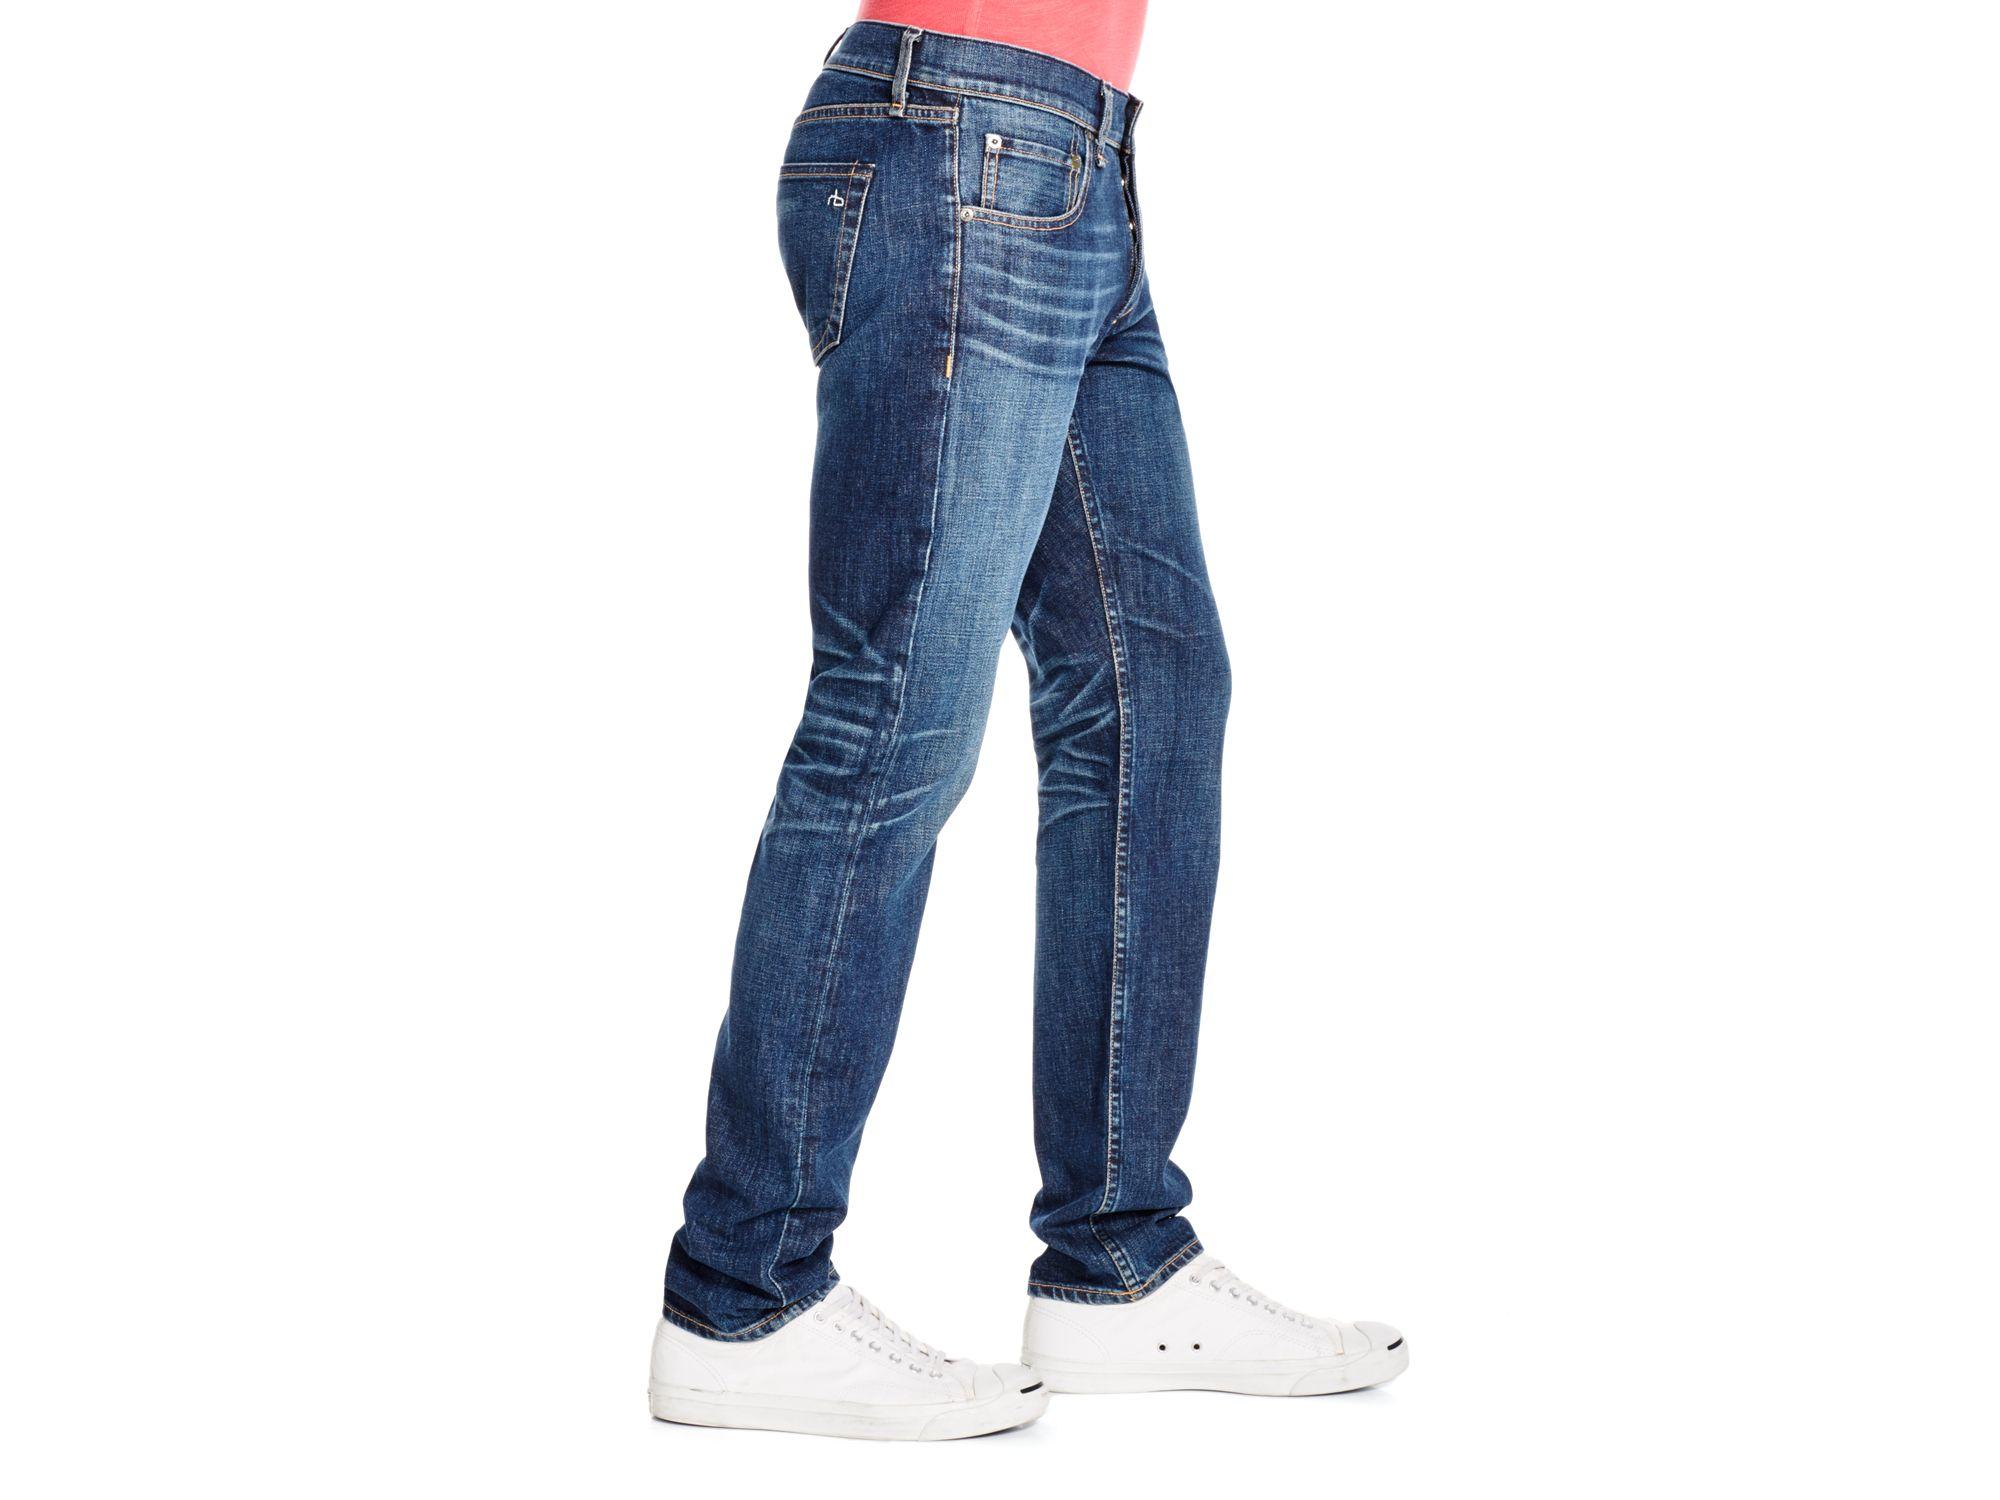 Rag & Bone Denim Fit 2 Slim Fit Jeans In Aged in Blue for Men